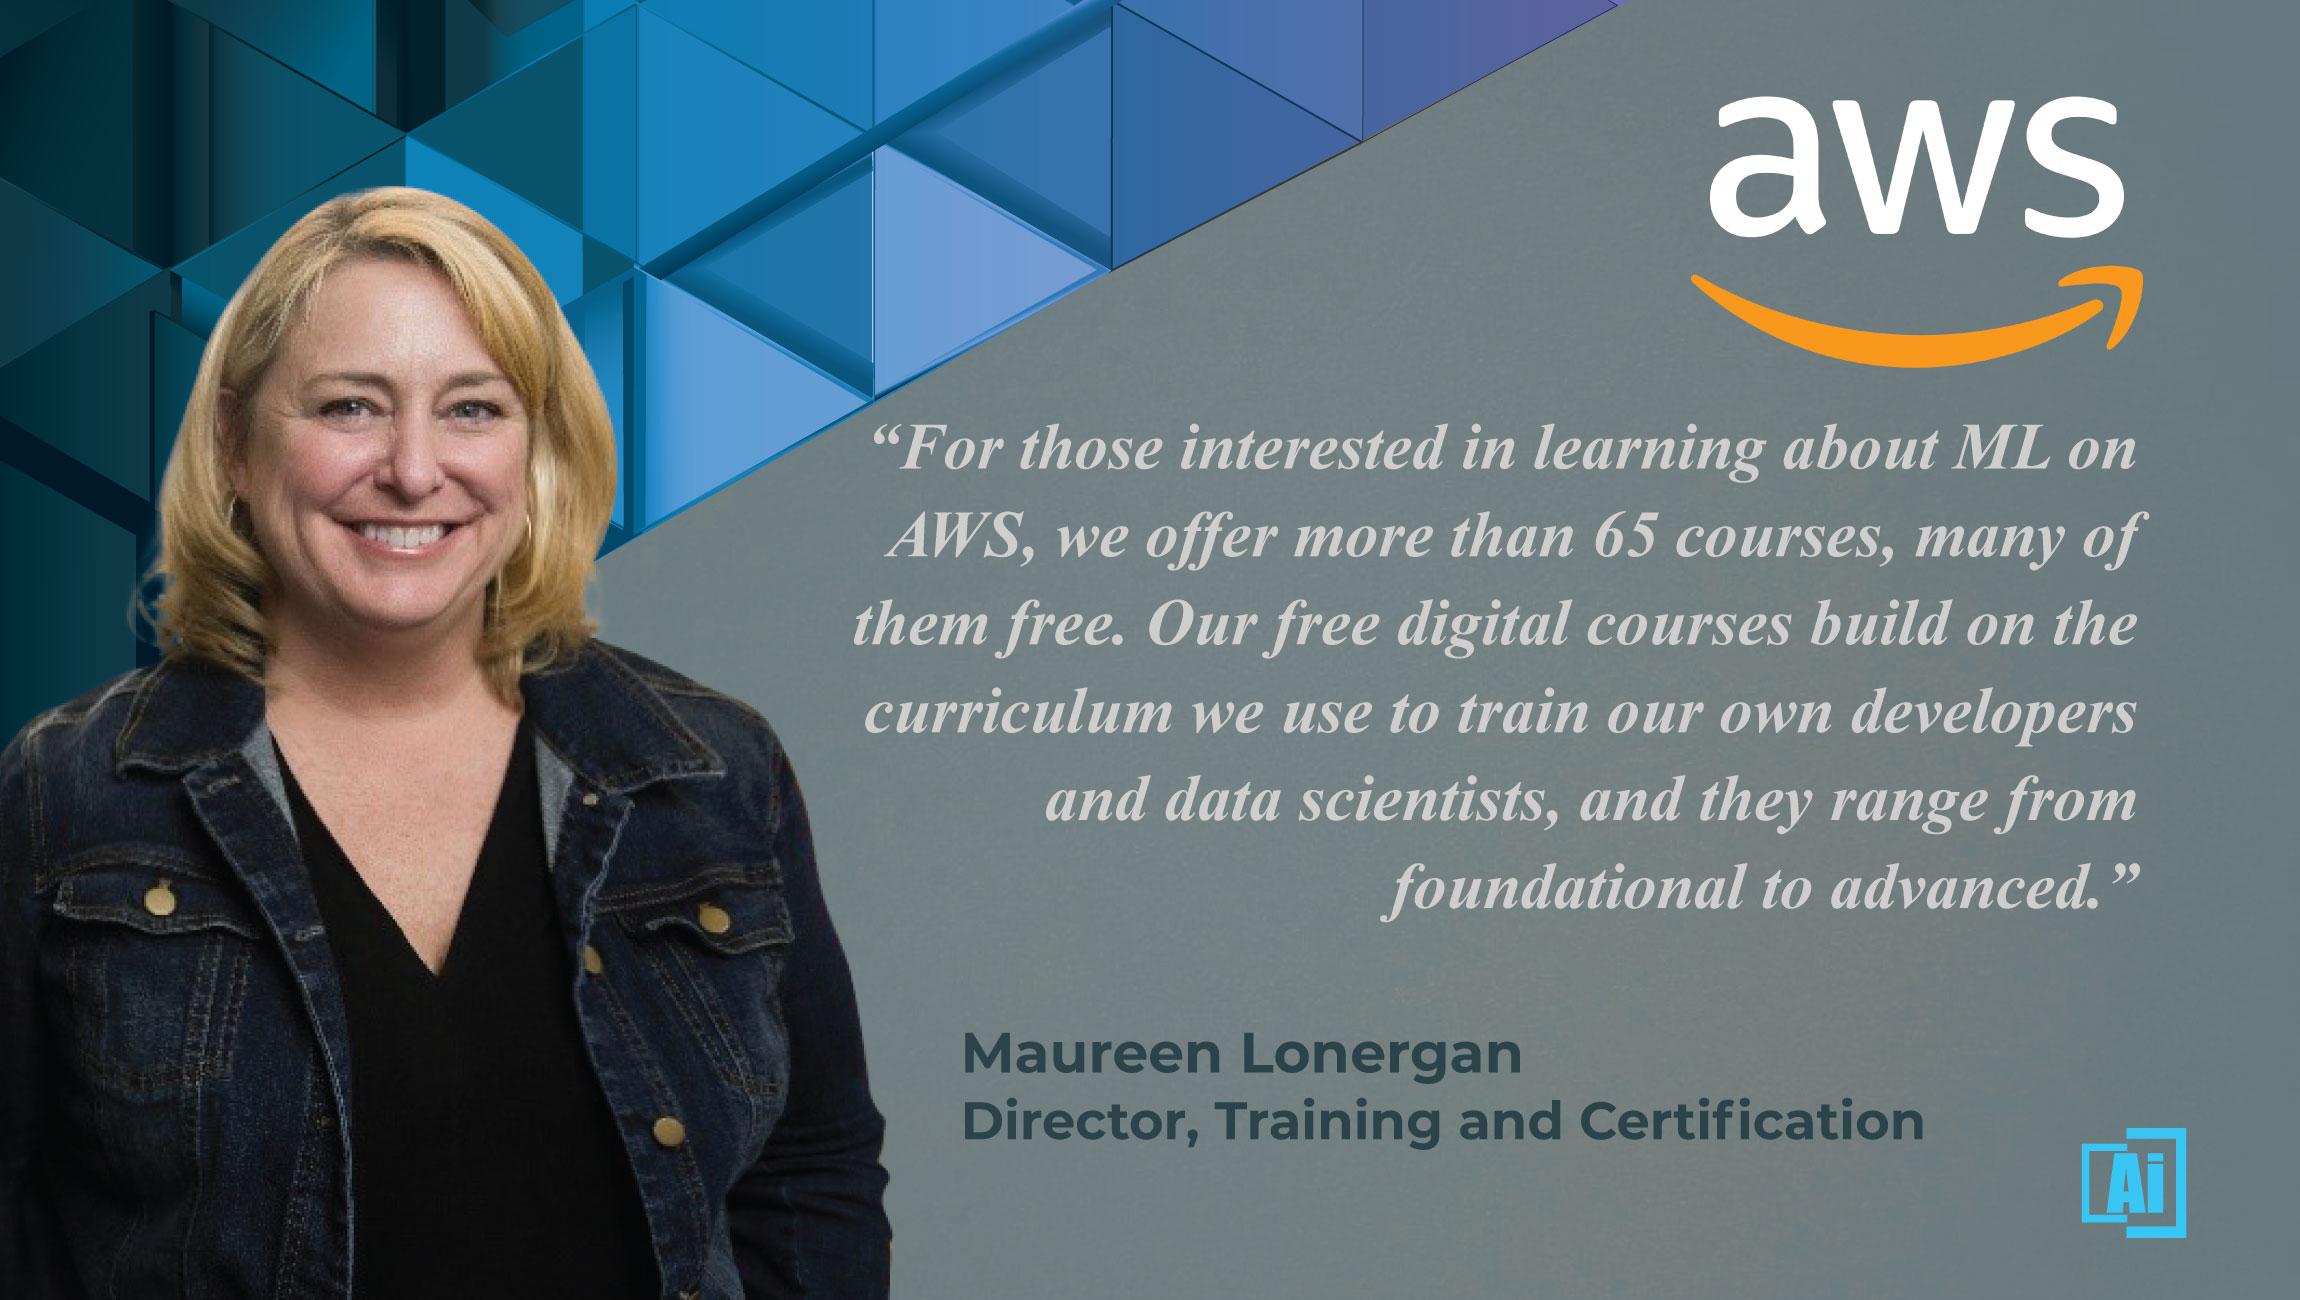 Maureen-Lonergan